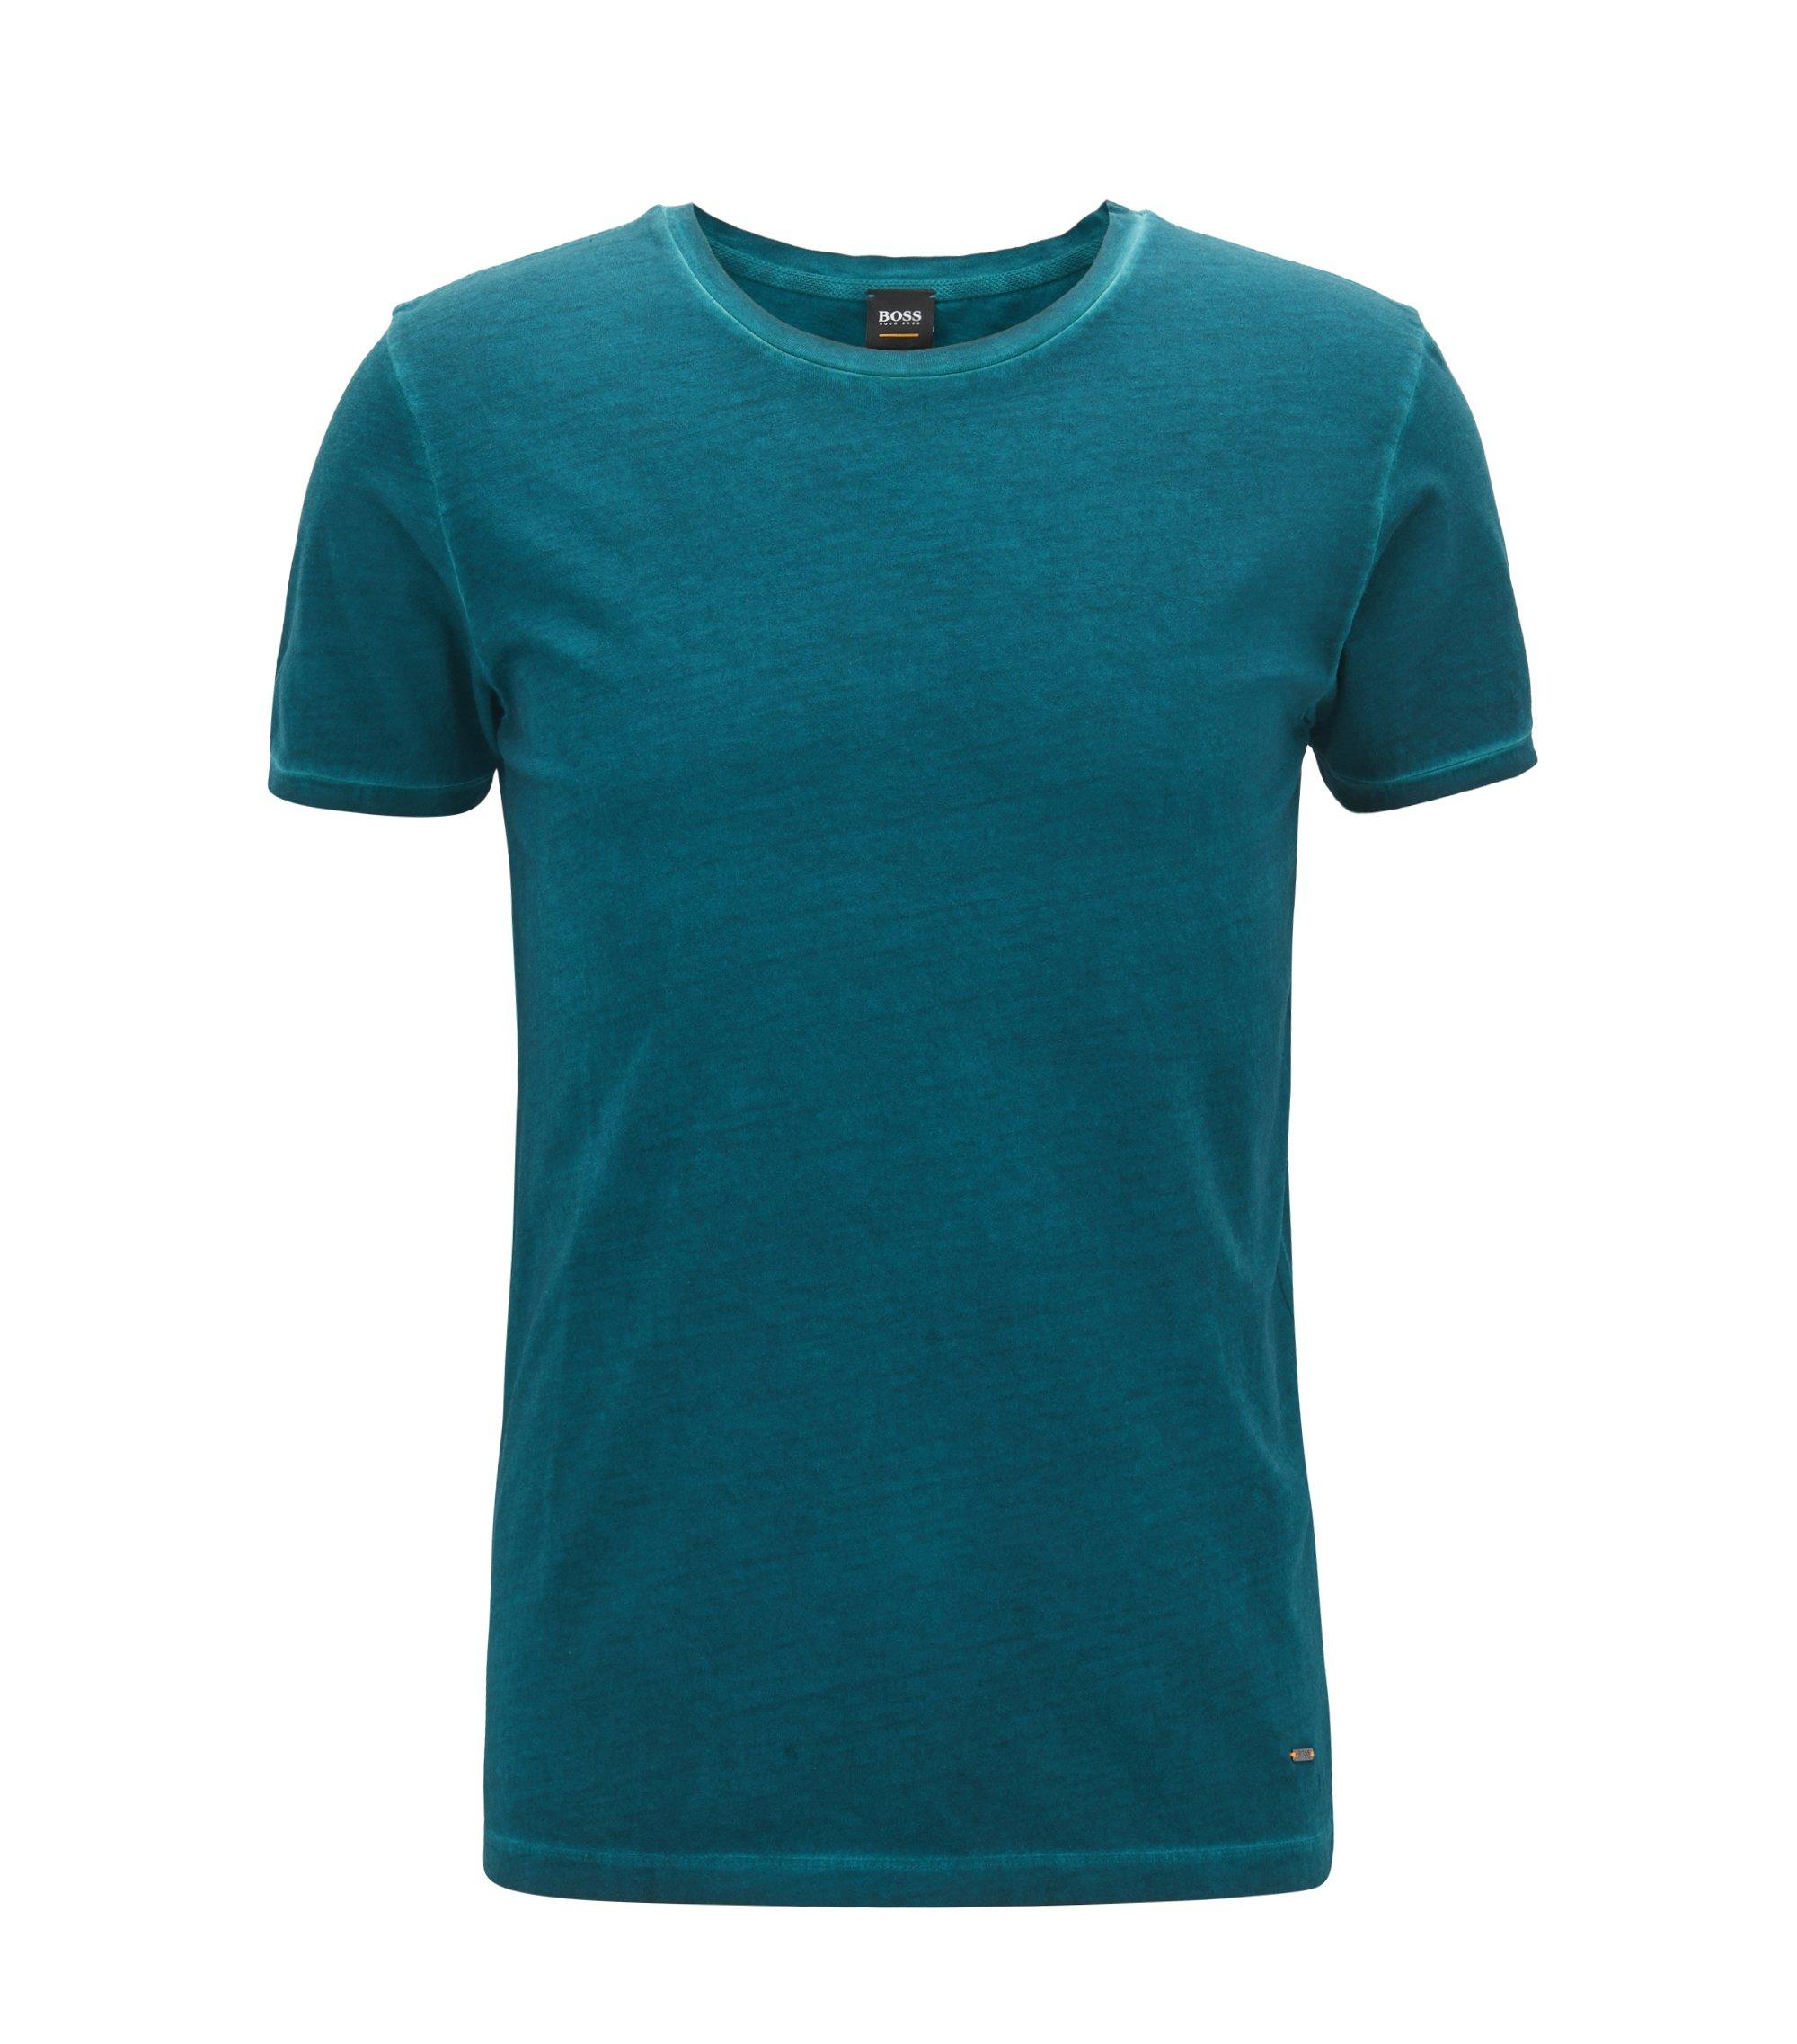 Stückgefärbtes Regular-Fit T-Shirt aus Baumwolle, Dunkelgrün